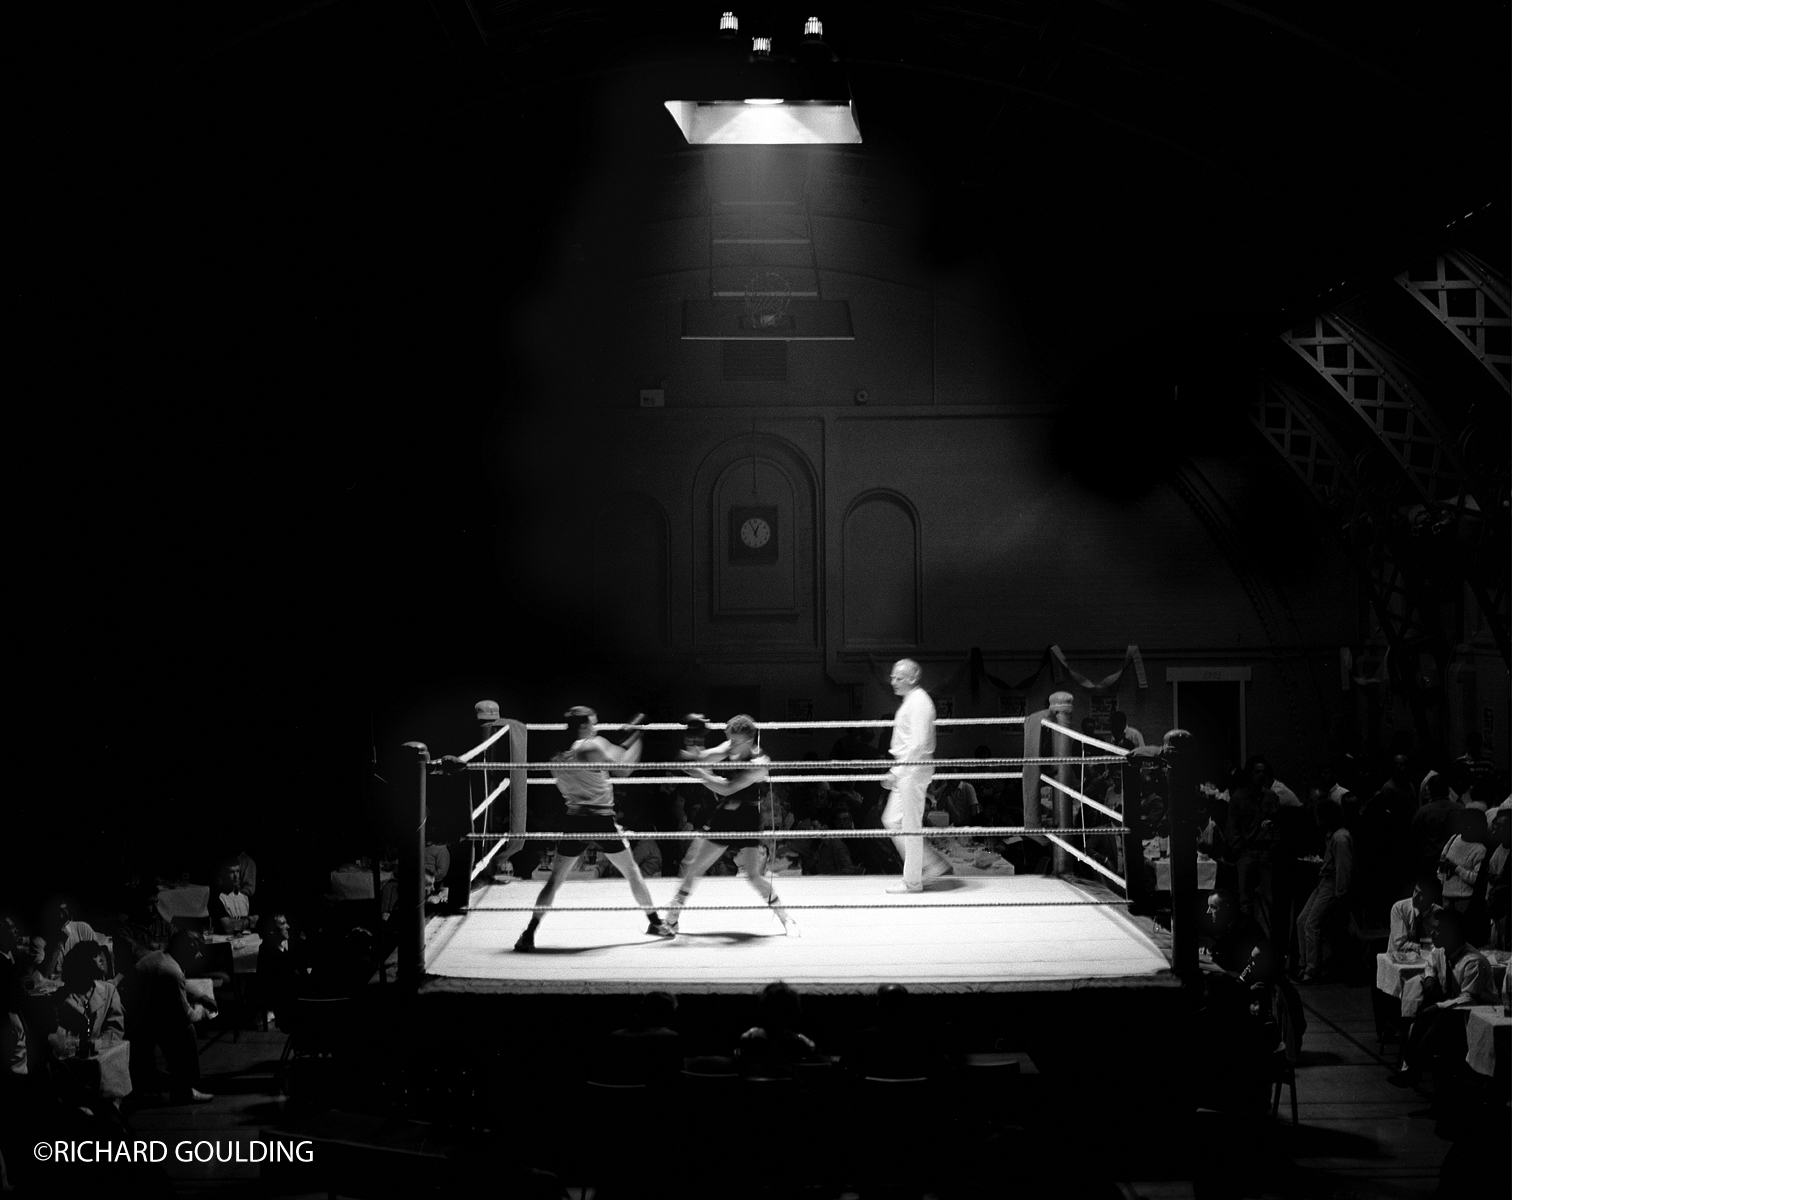 richard goulding sport photographer_SQ_51.jpg